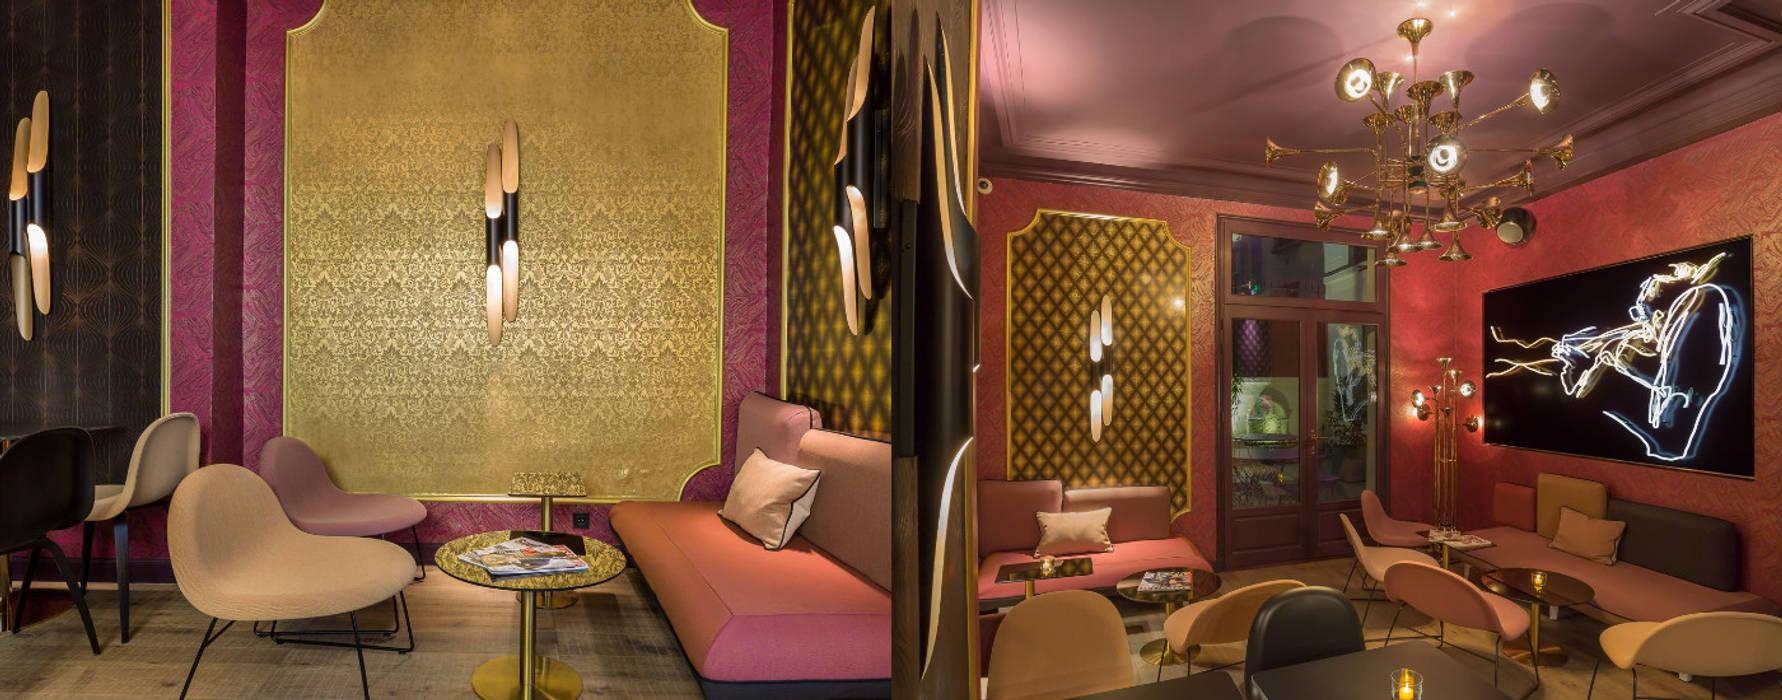 Idol Hotel, Paris by DelightFULL Сучасний Мідь / Бронза / Латунь